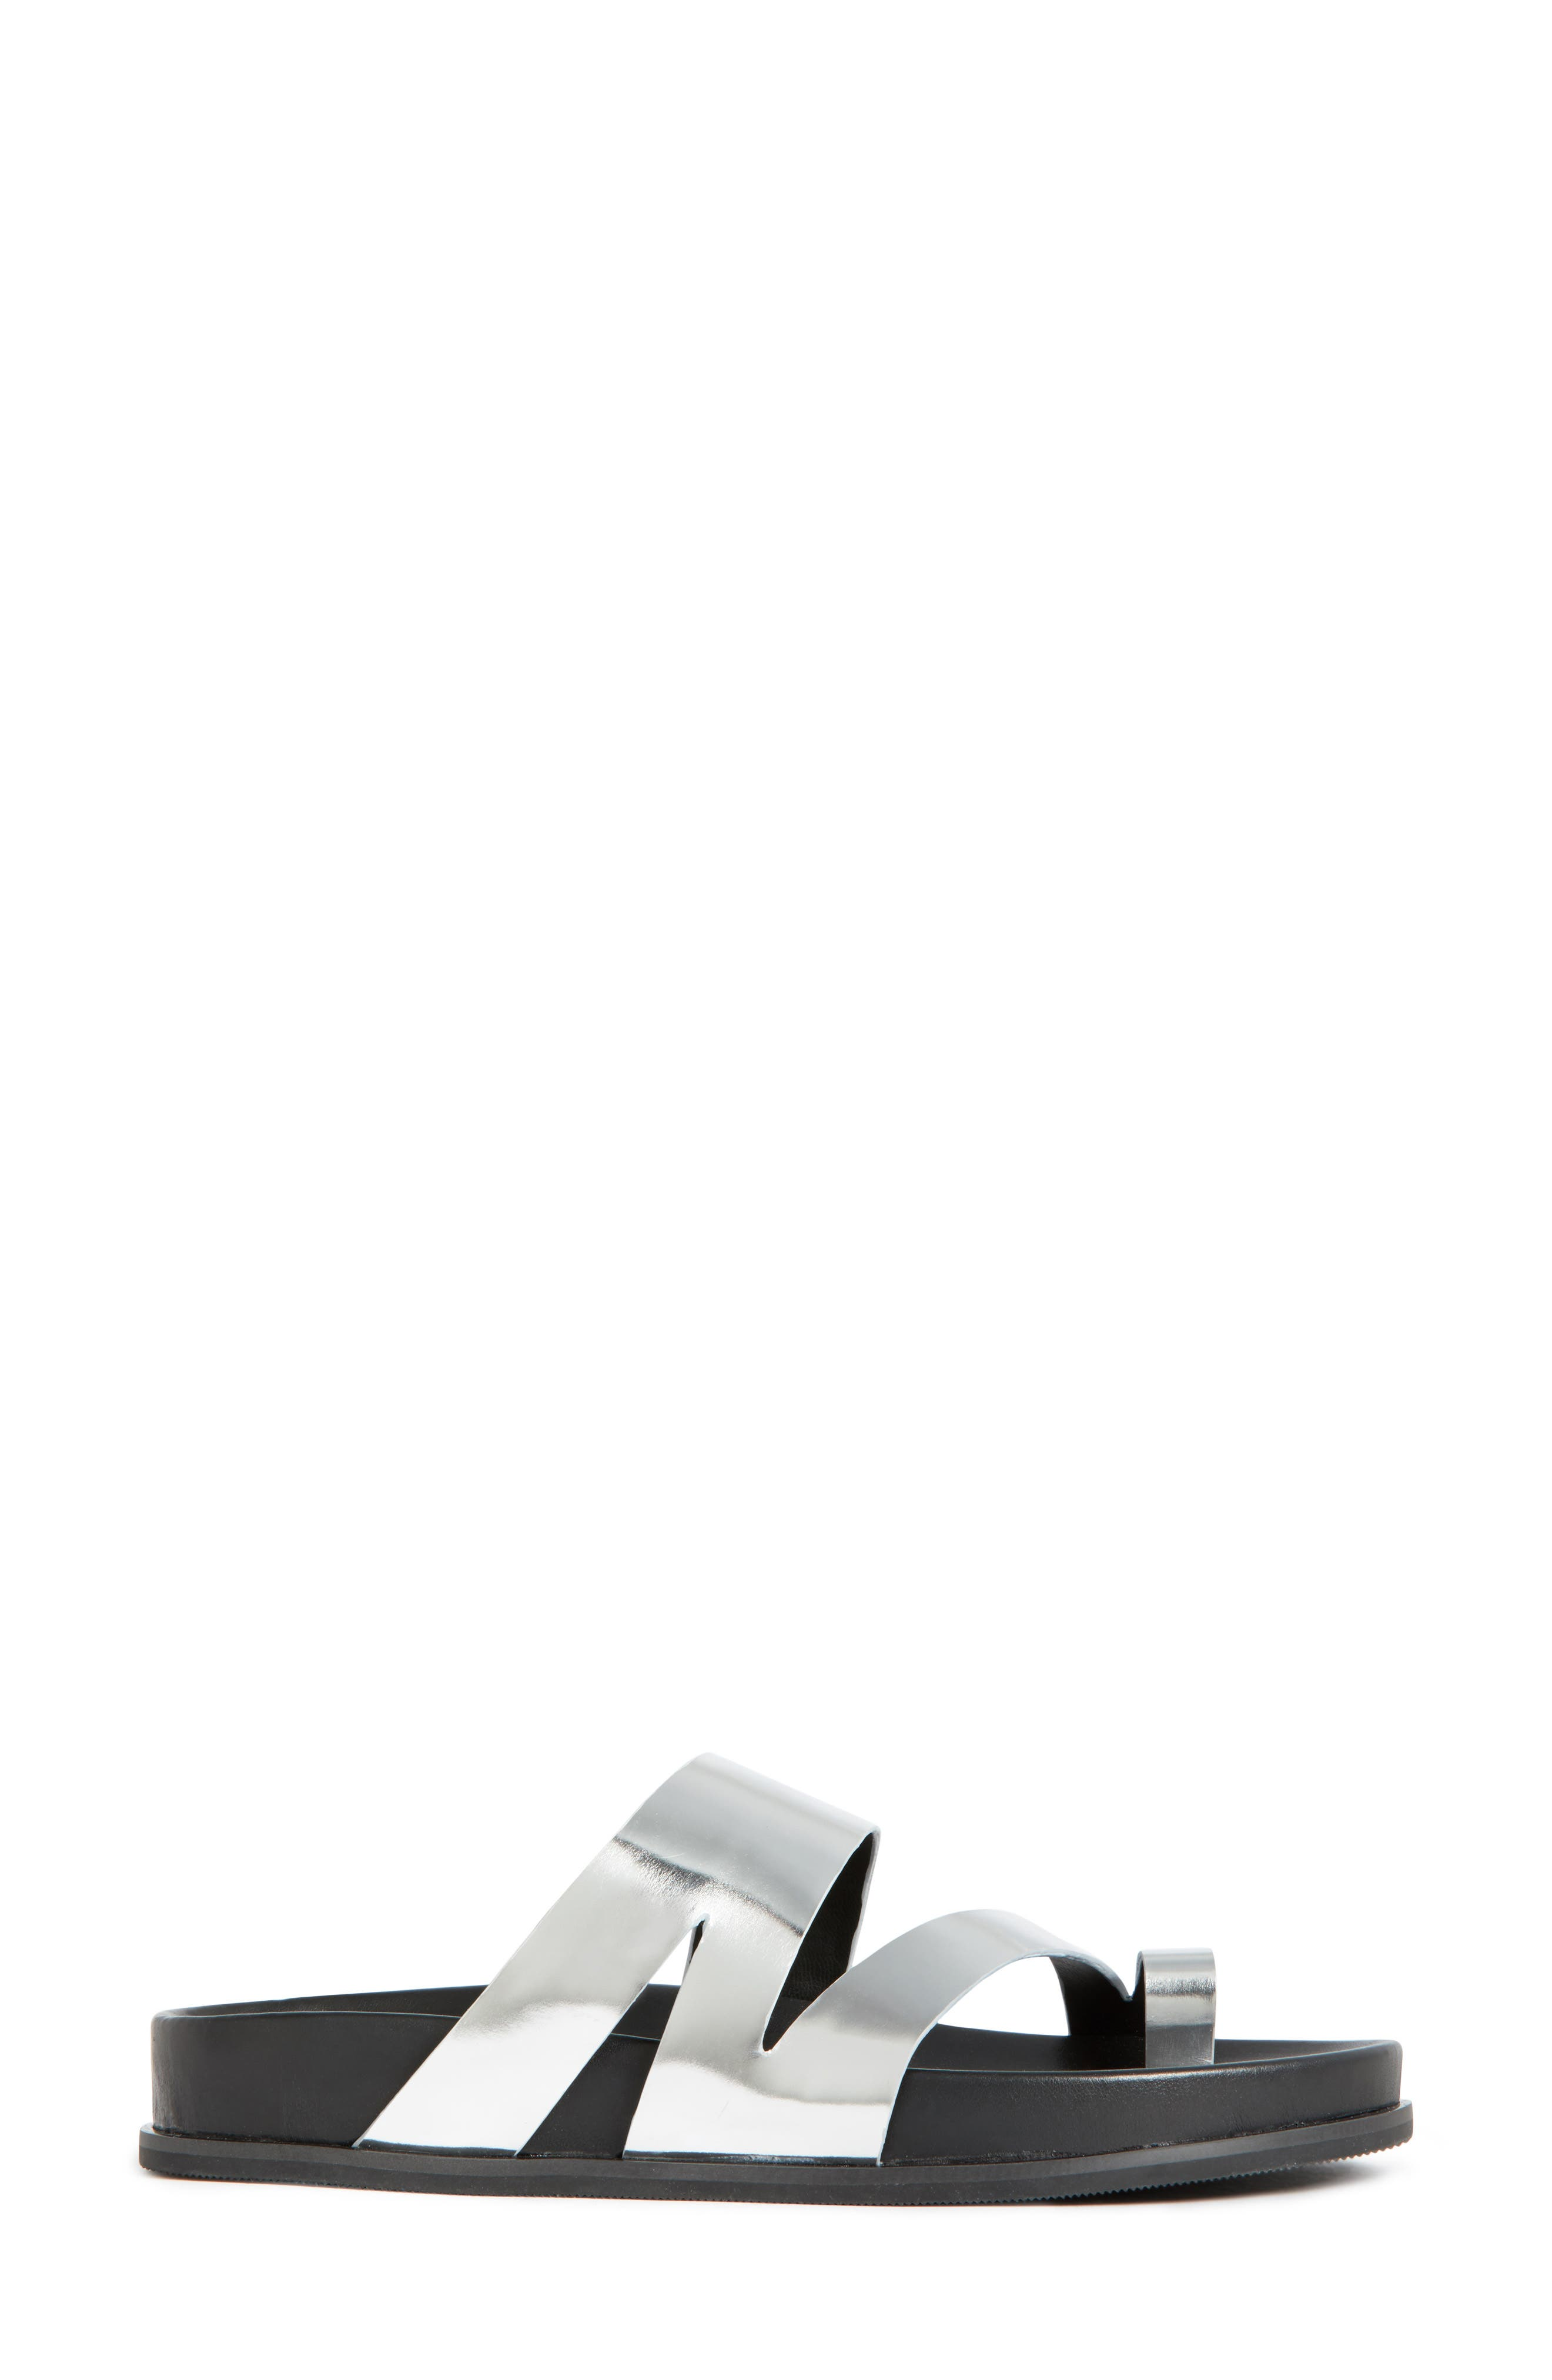 Yamini Sandal,                             Alternate thumbnail 3, color,                             Silver Leather